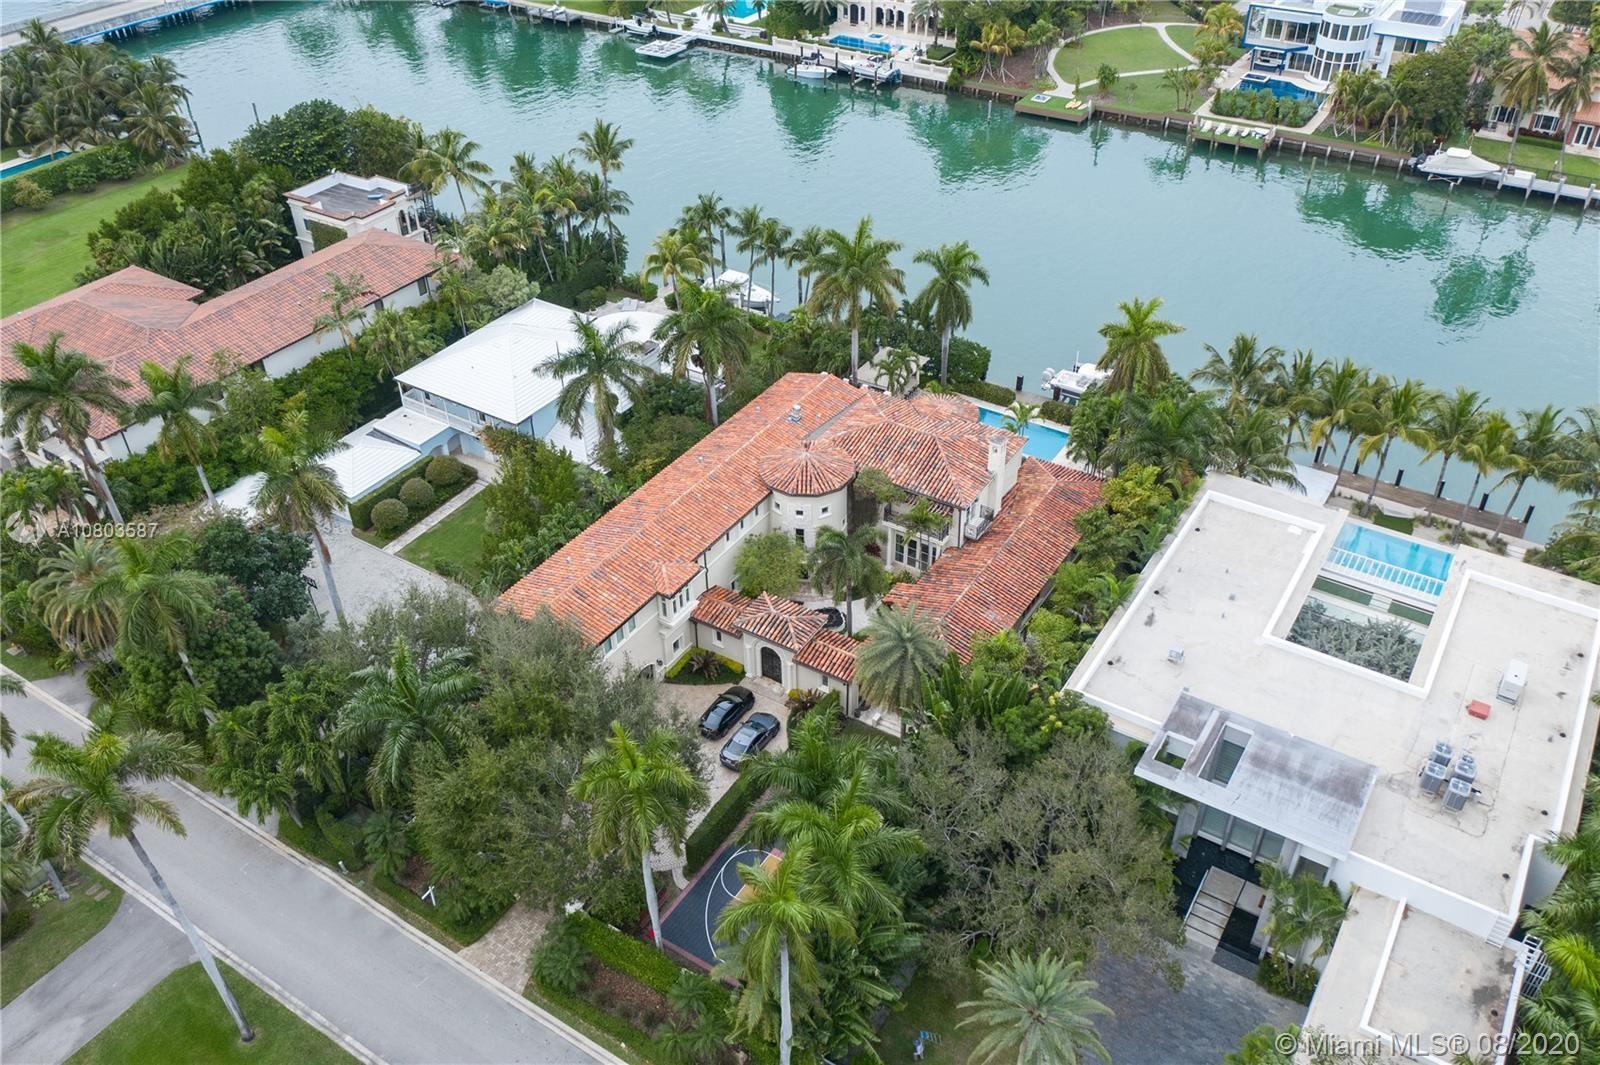 Photo 67 of Listing MLS a10803587 in 1511 W 27th St Miami Beach FL 33140